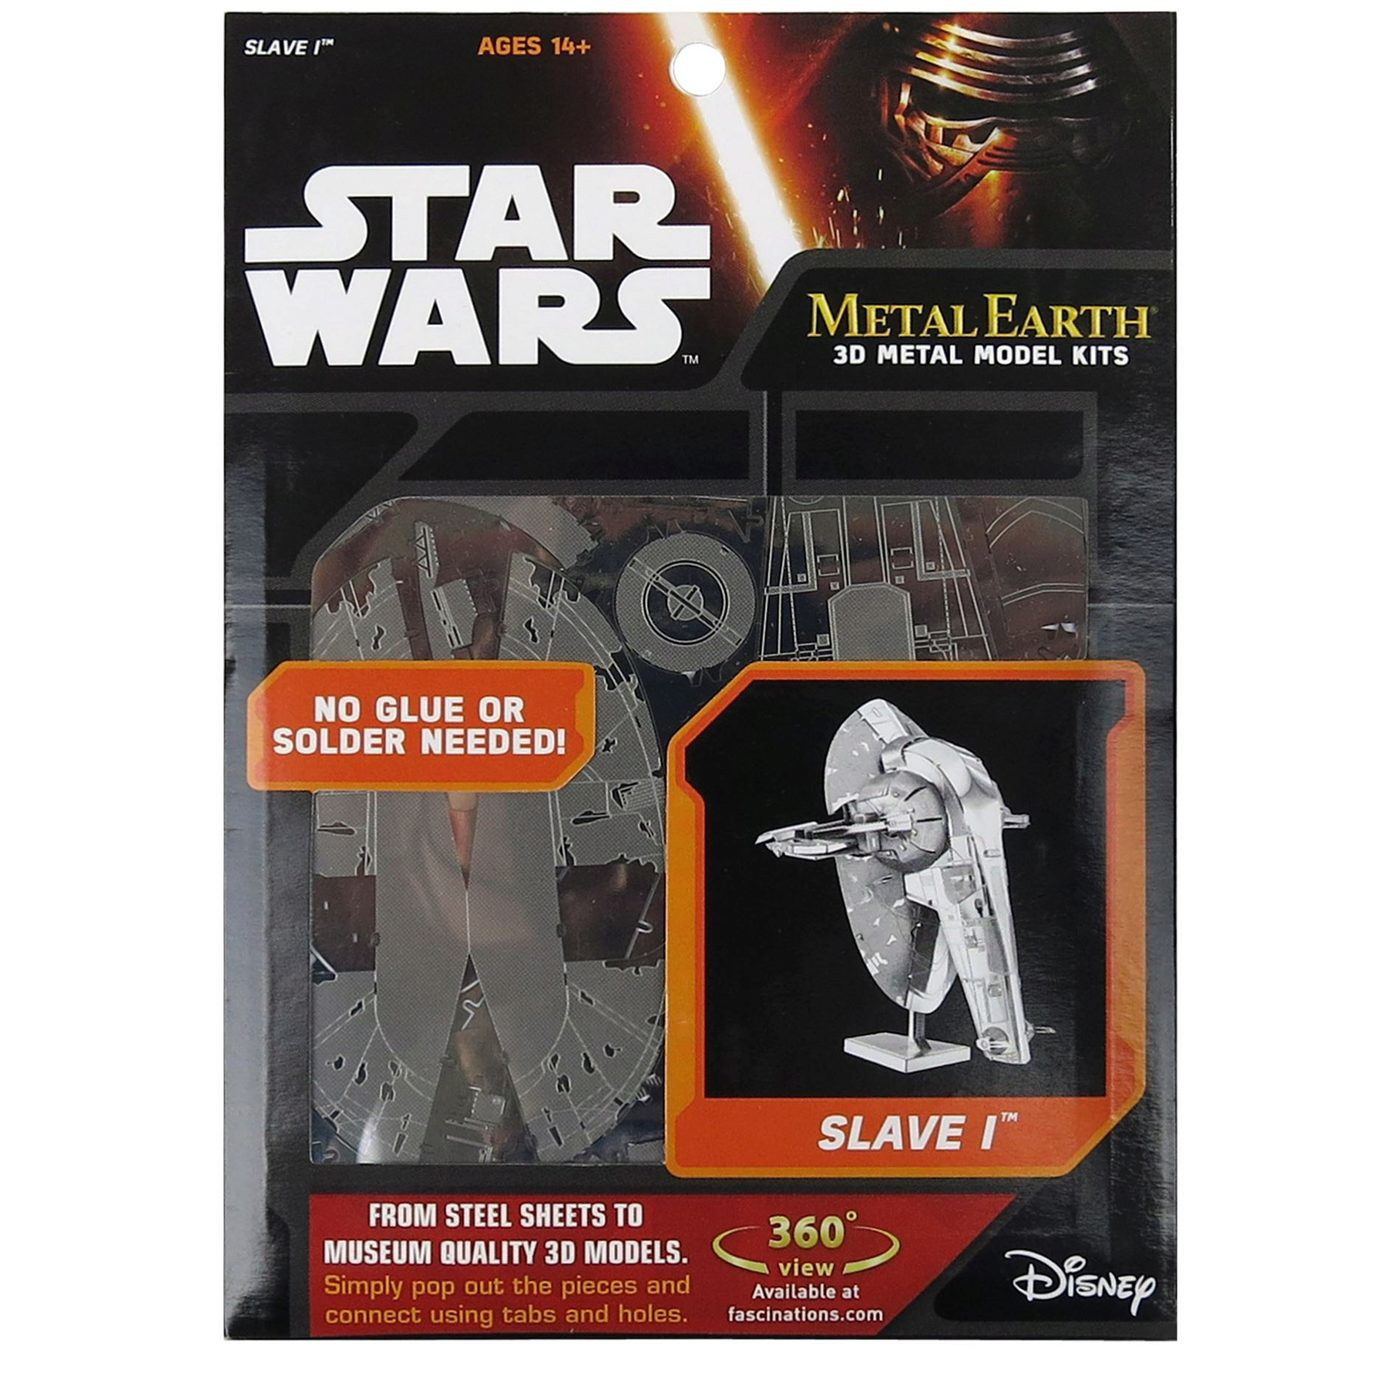 Star Wars Slave 1 Metal Earth Model Kit